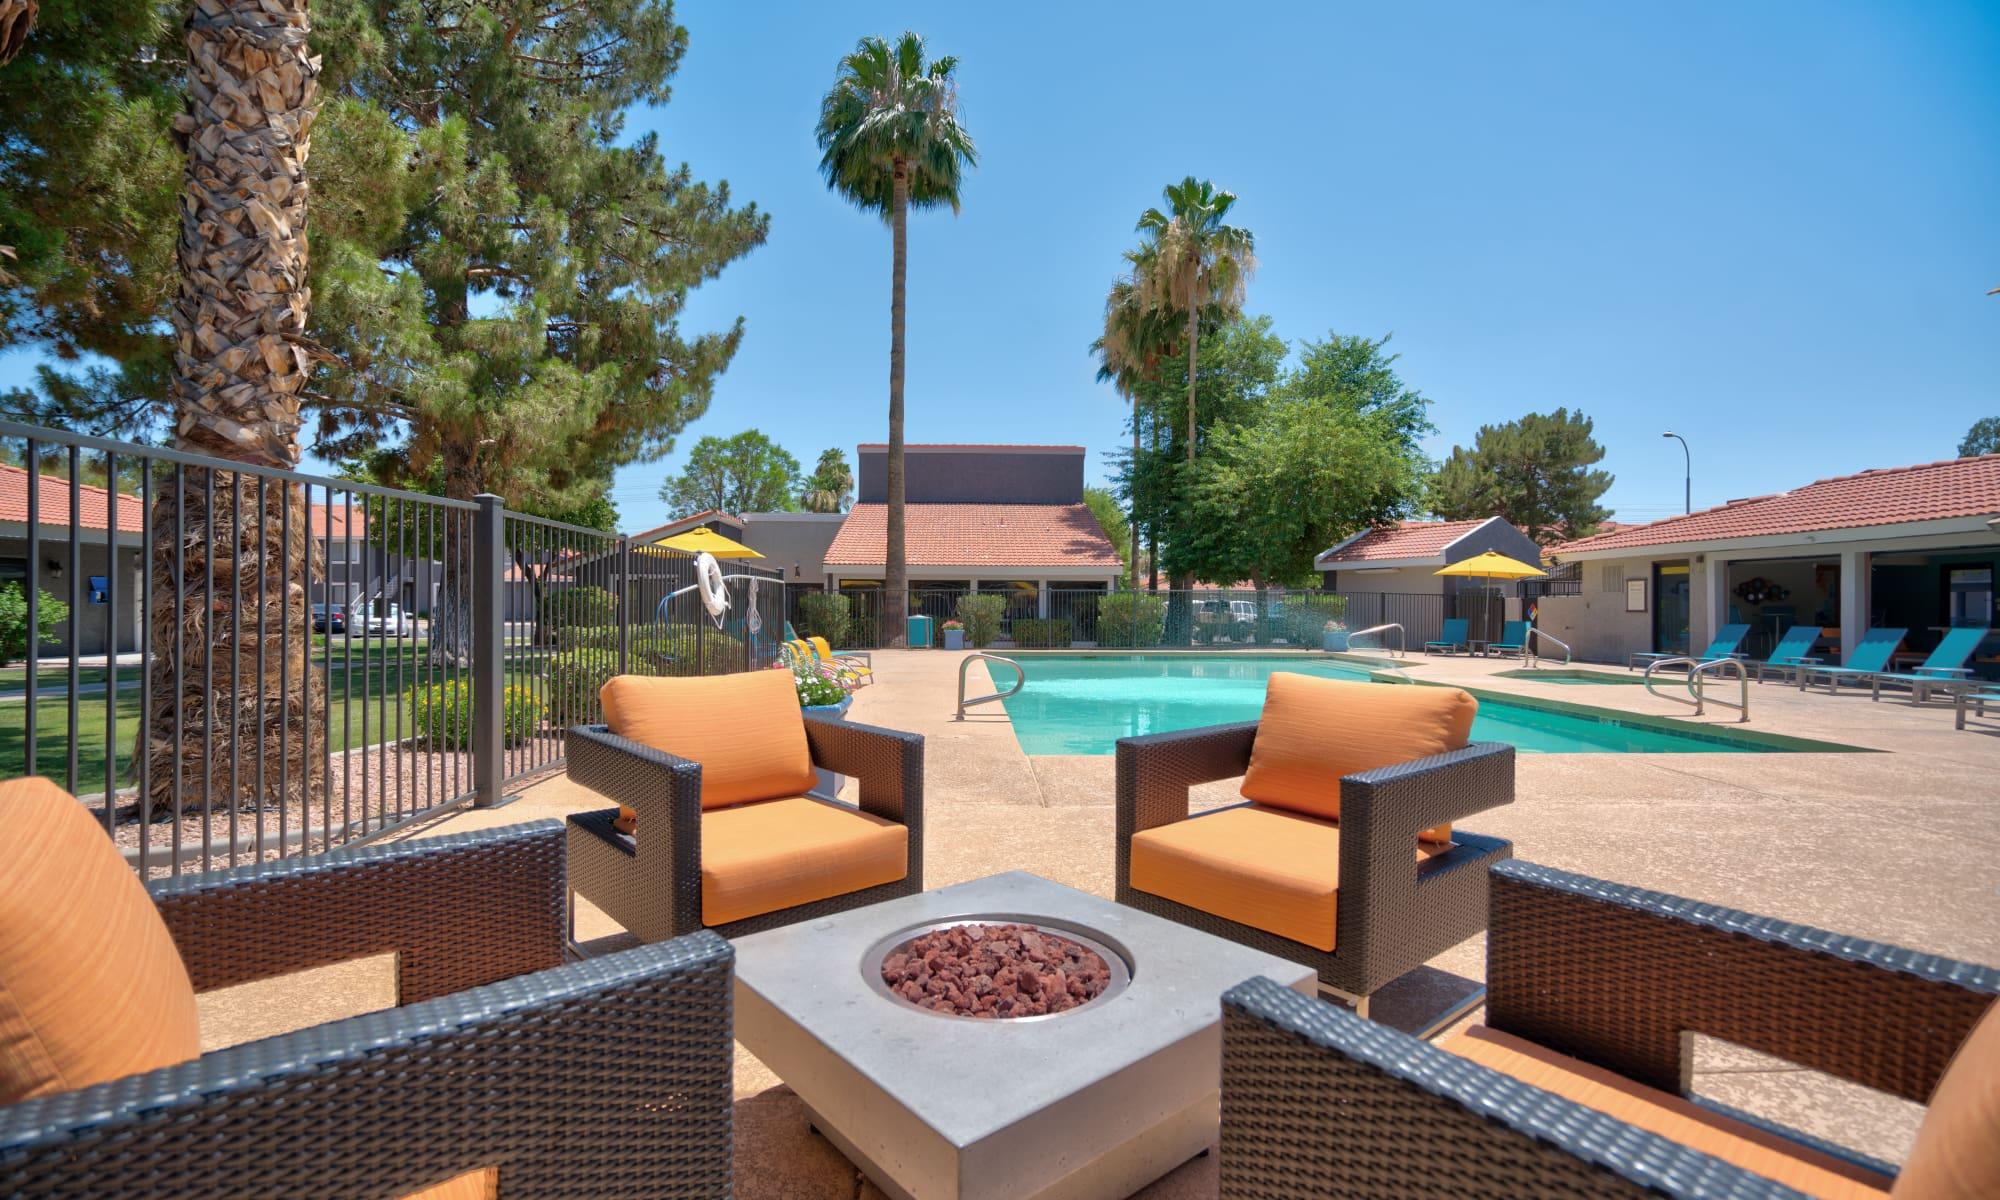 Apartments at Argenta Apartment Homes in Mesa, Arizona